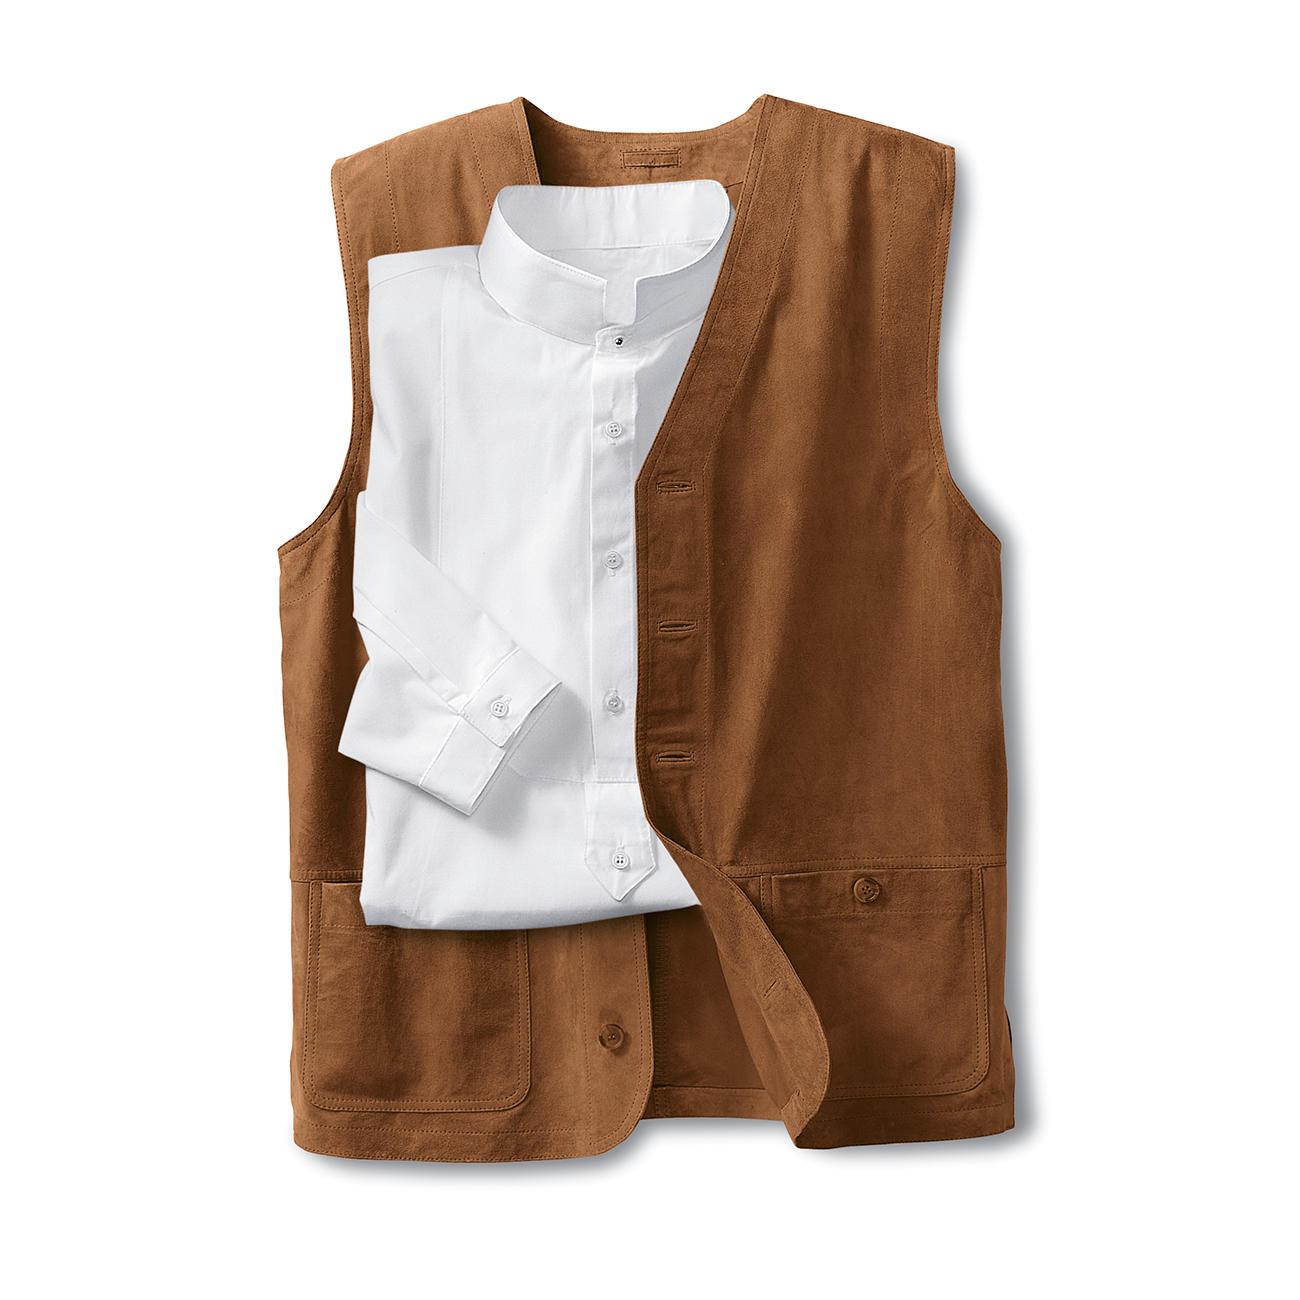 Waistcoat With T-shirts Unbuttoned Shirts